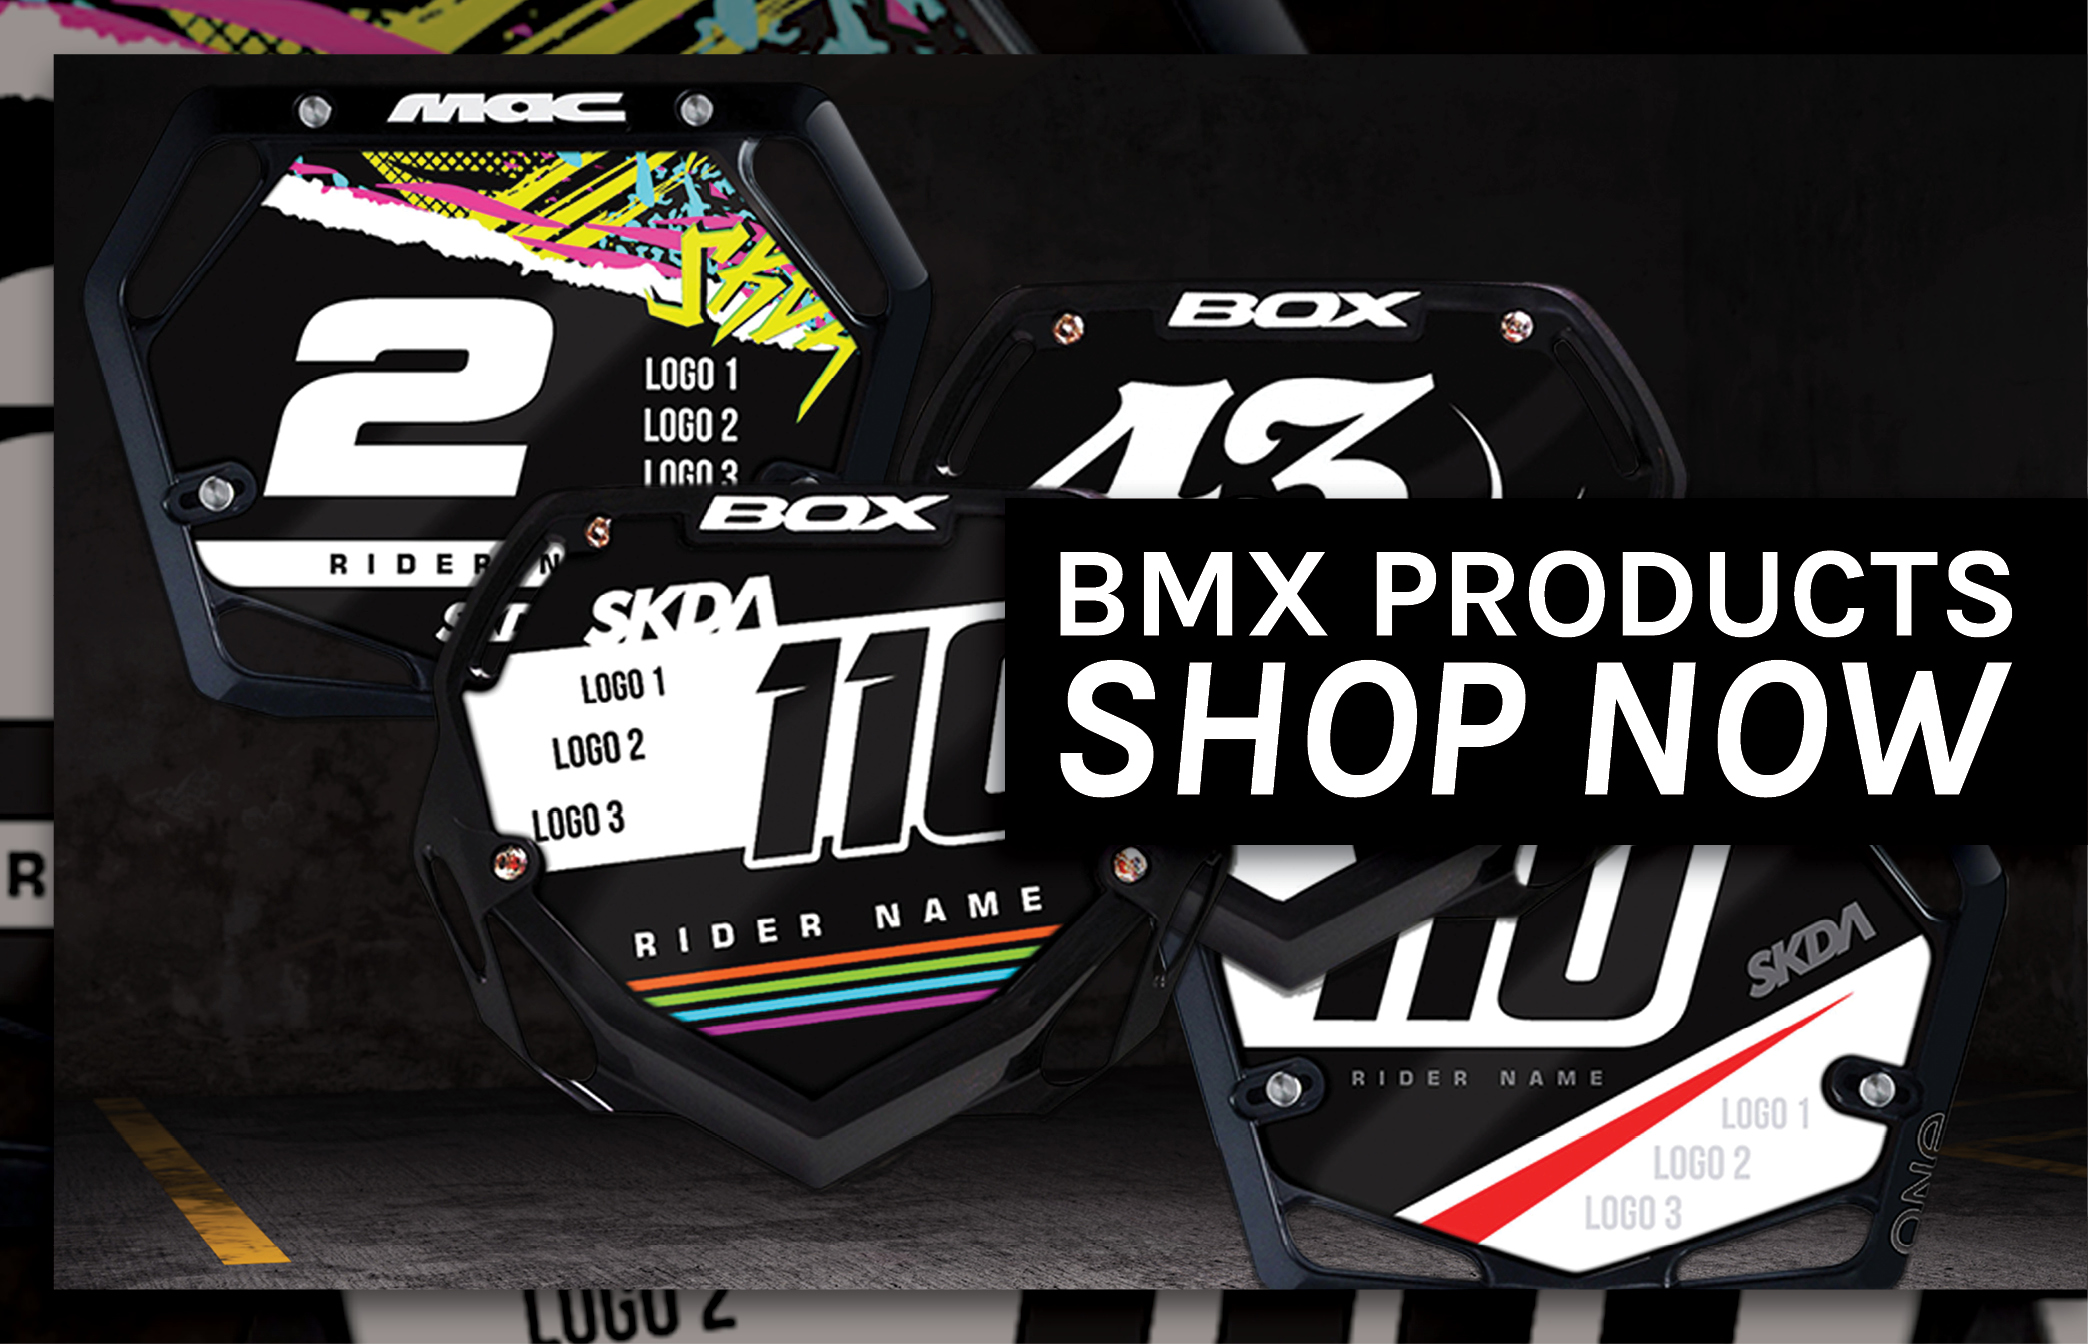 BMX PRODUCTS